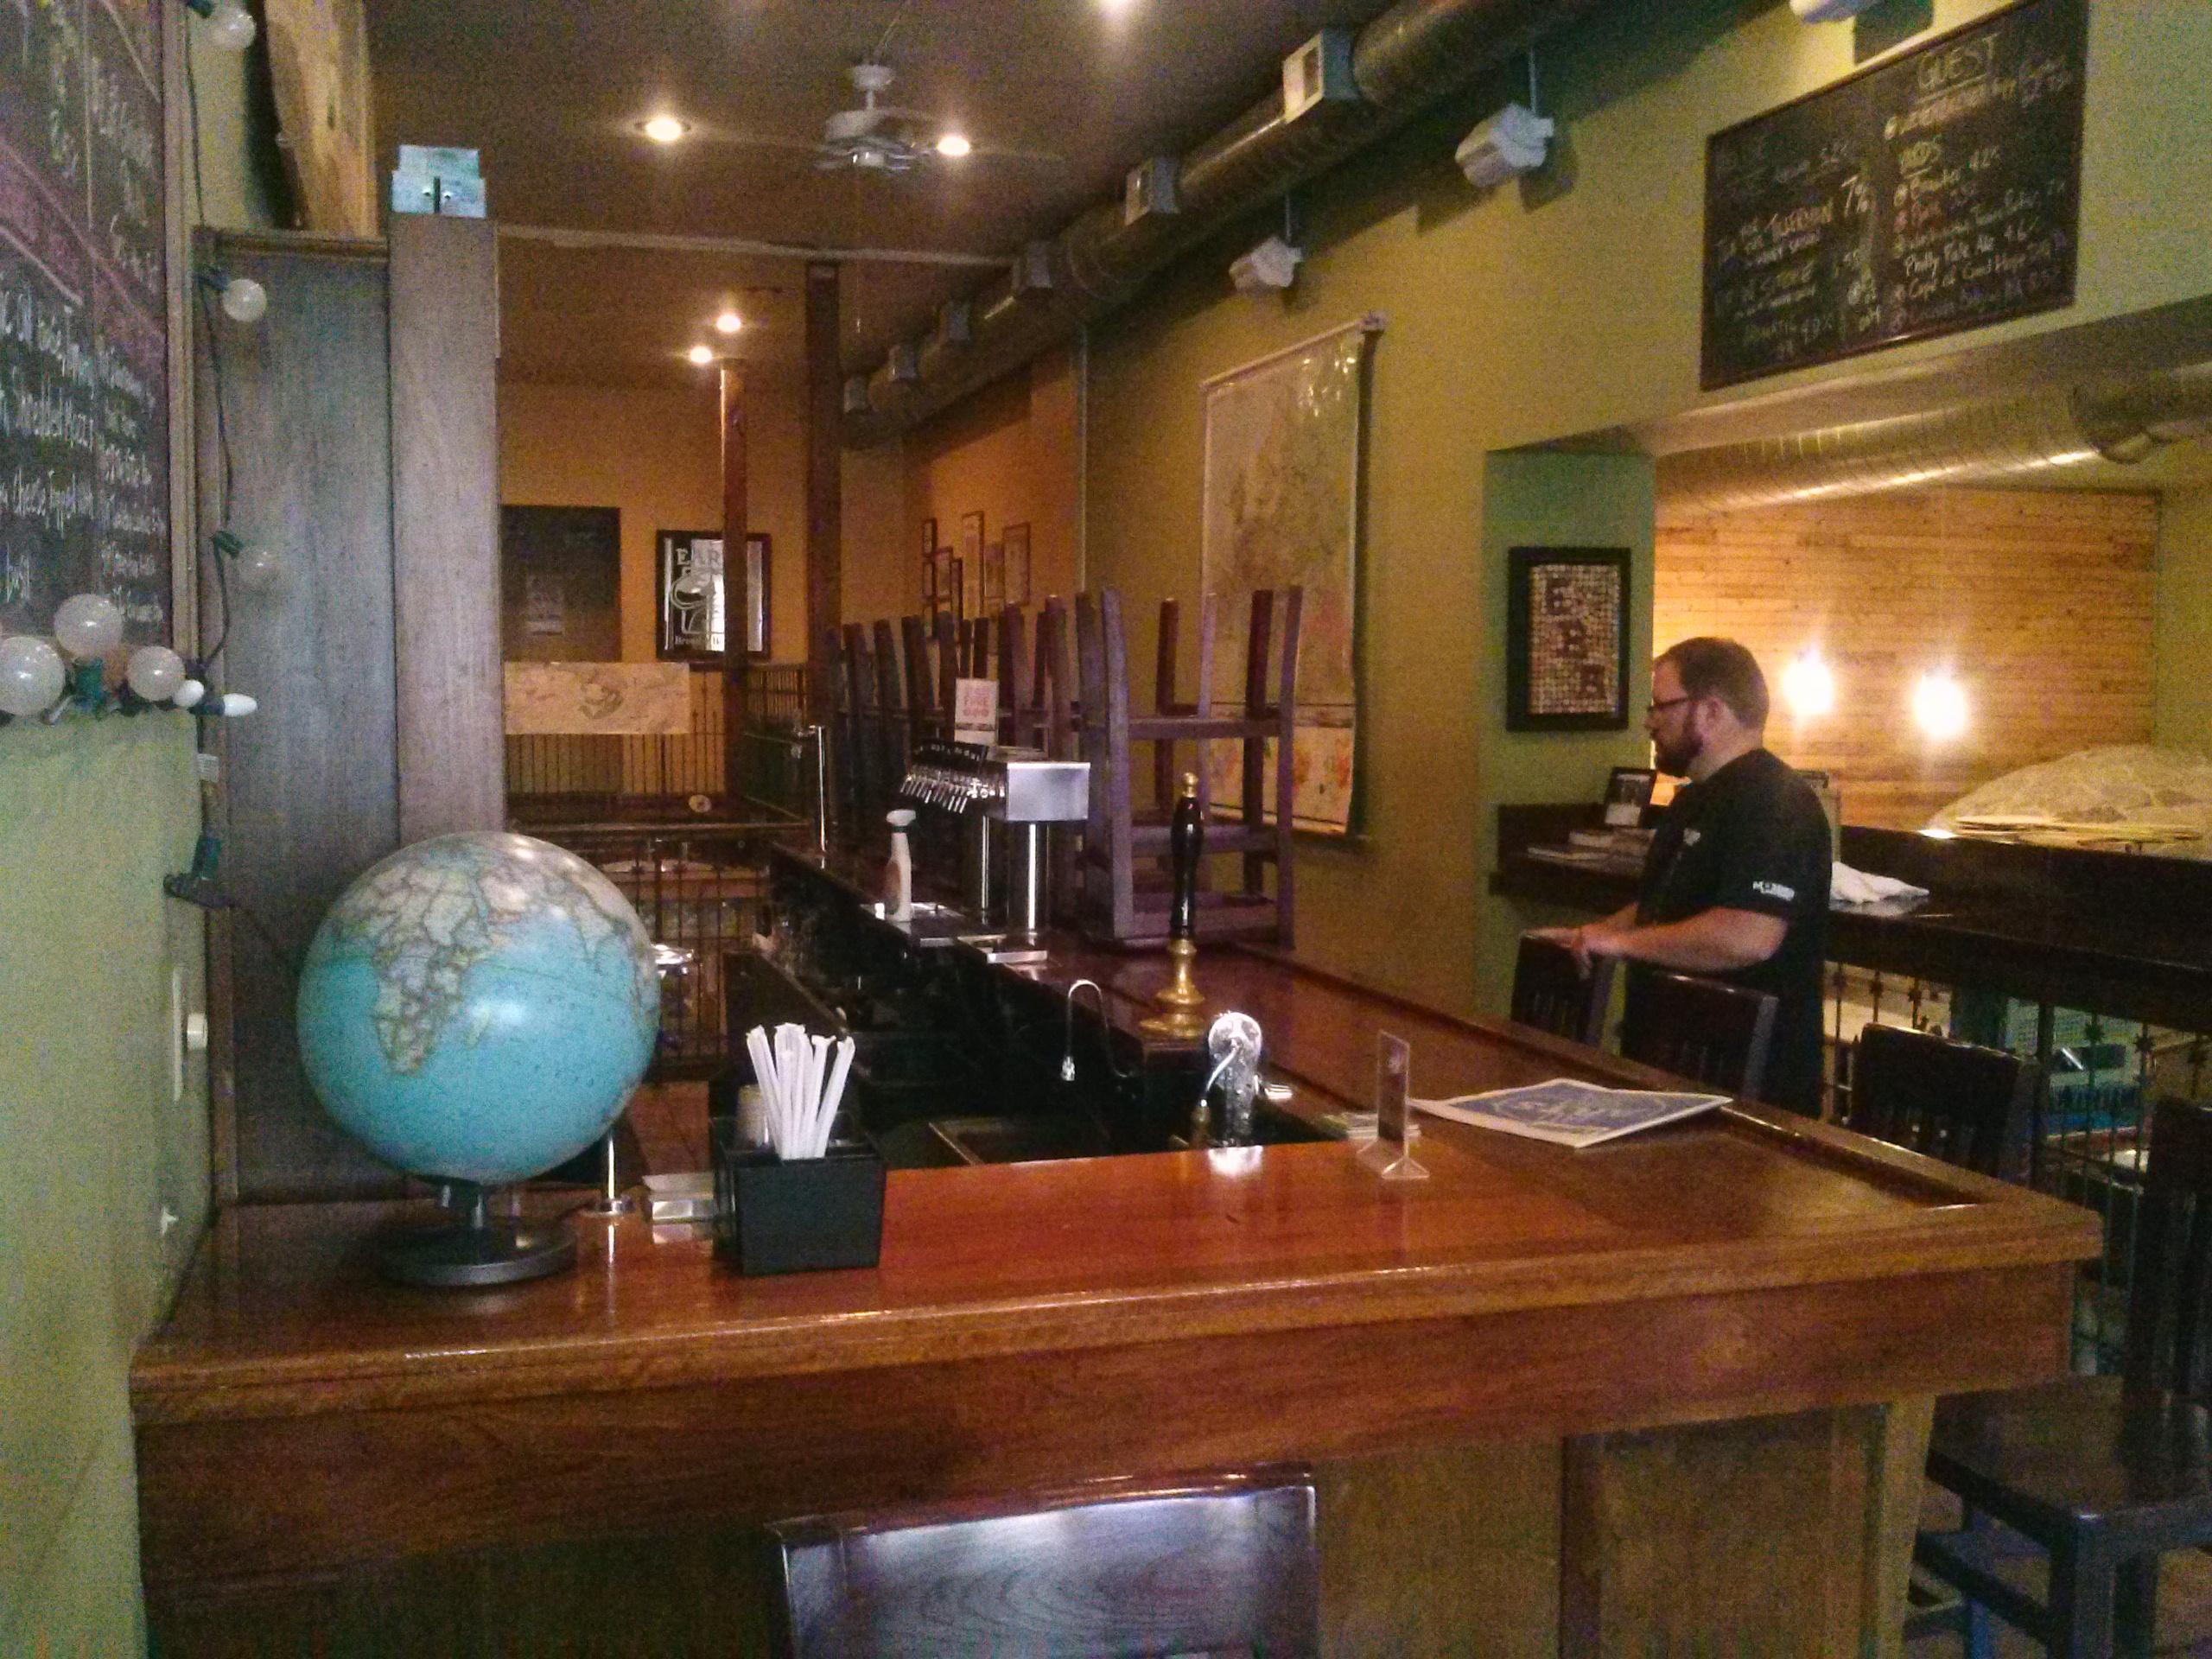 John setting up bar for customers